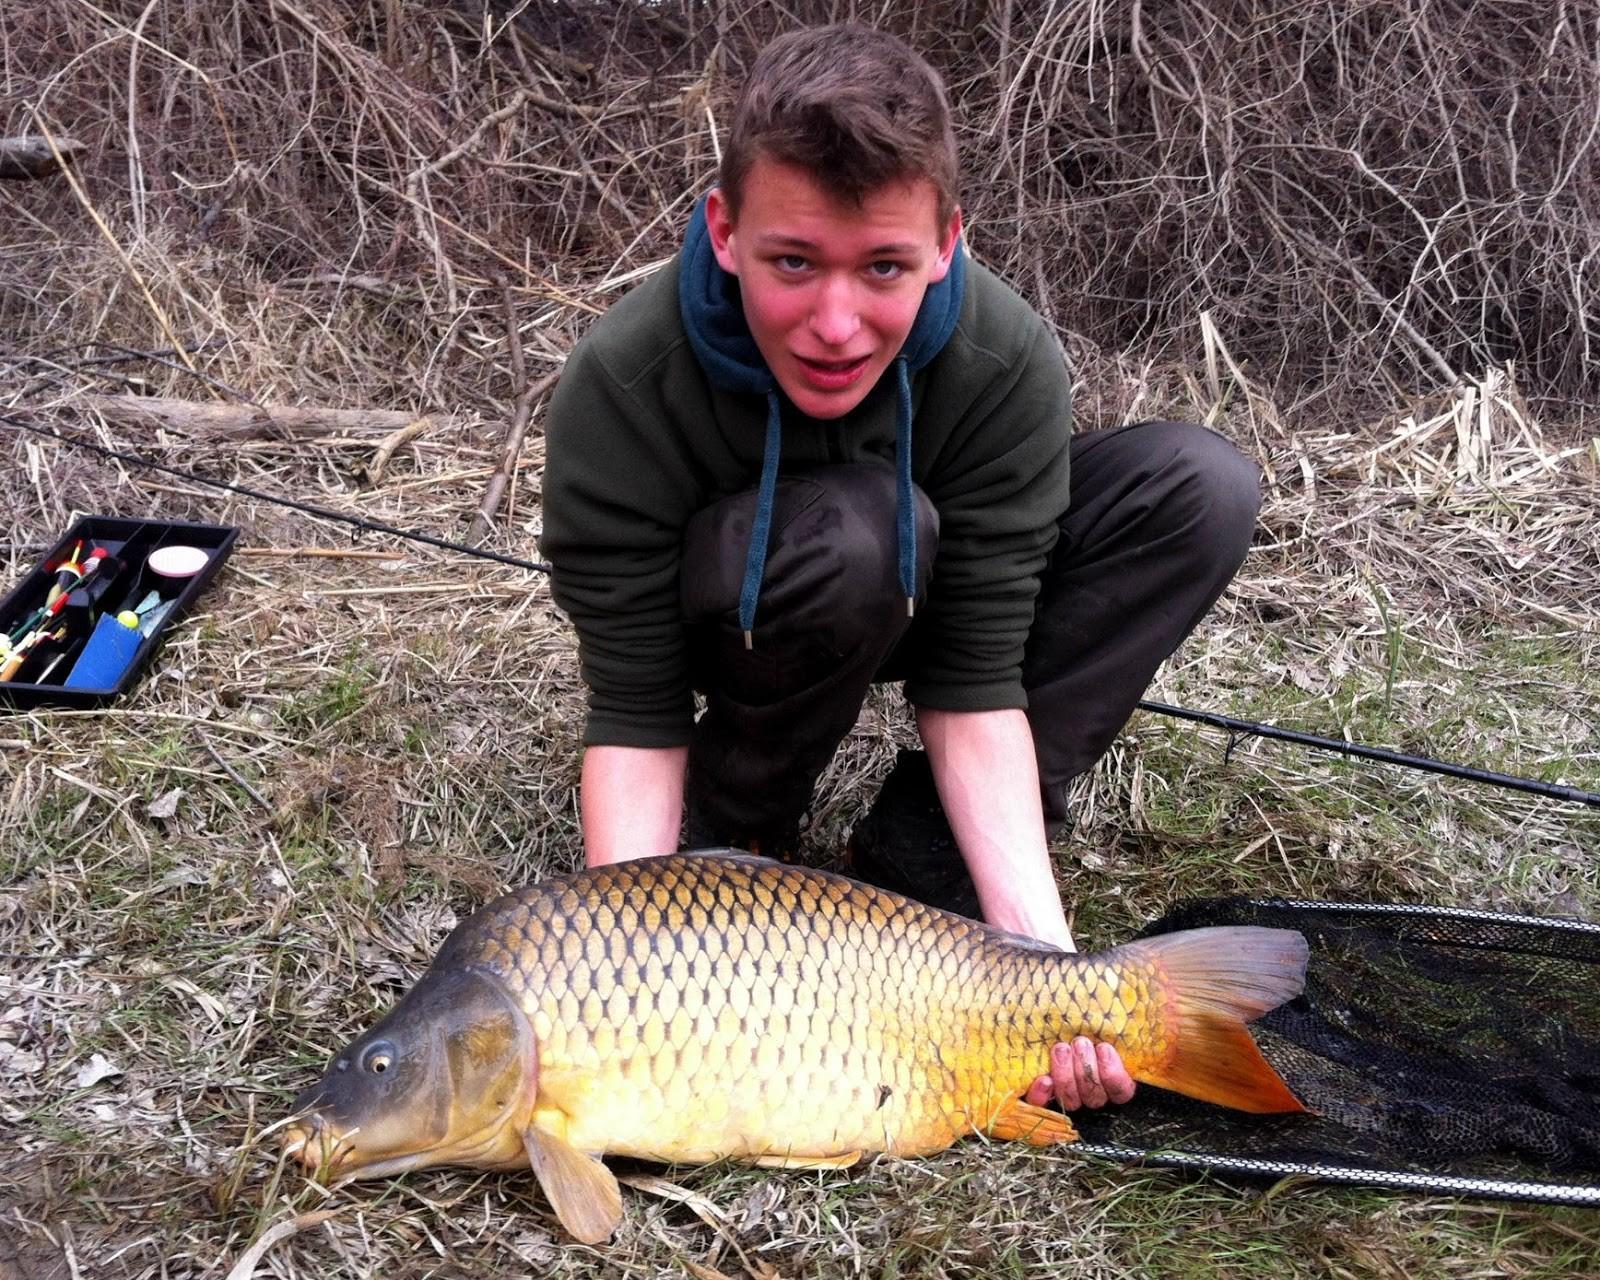 Matthias Pfeifhofer - Karpfen - 12,0kg 09.03.2013 - Donauarm (Revier III)